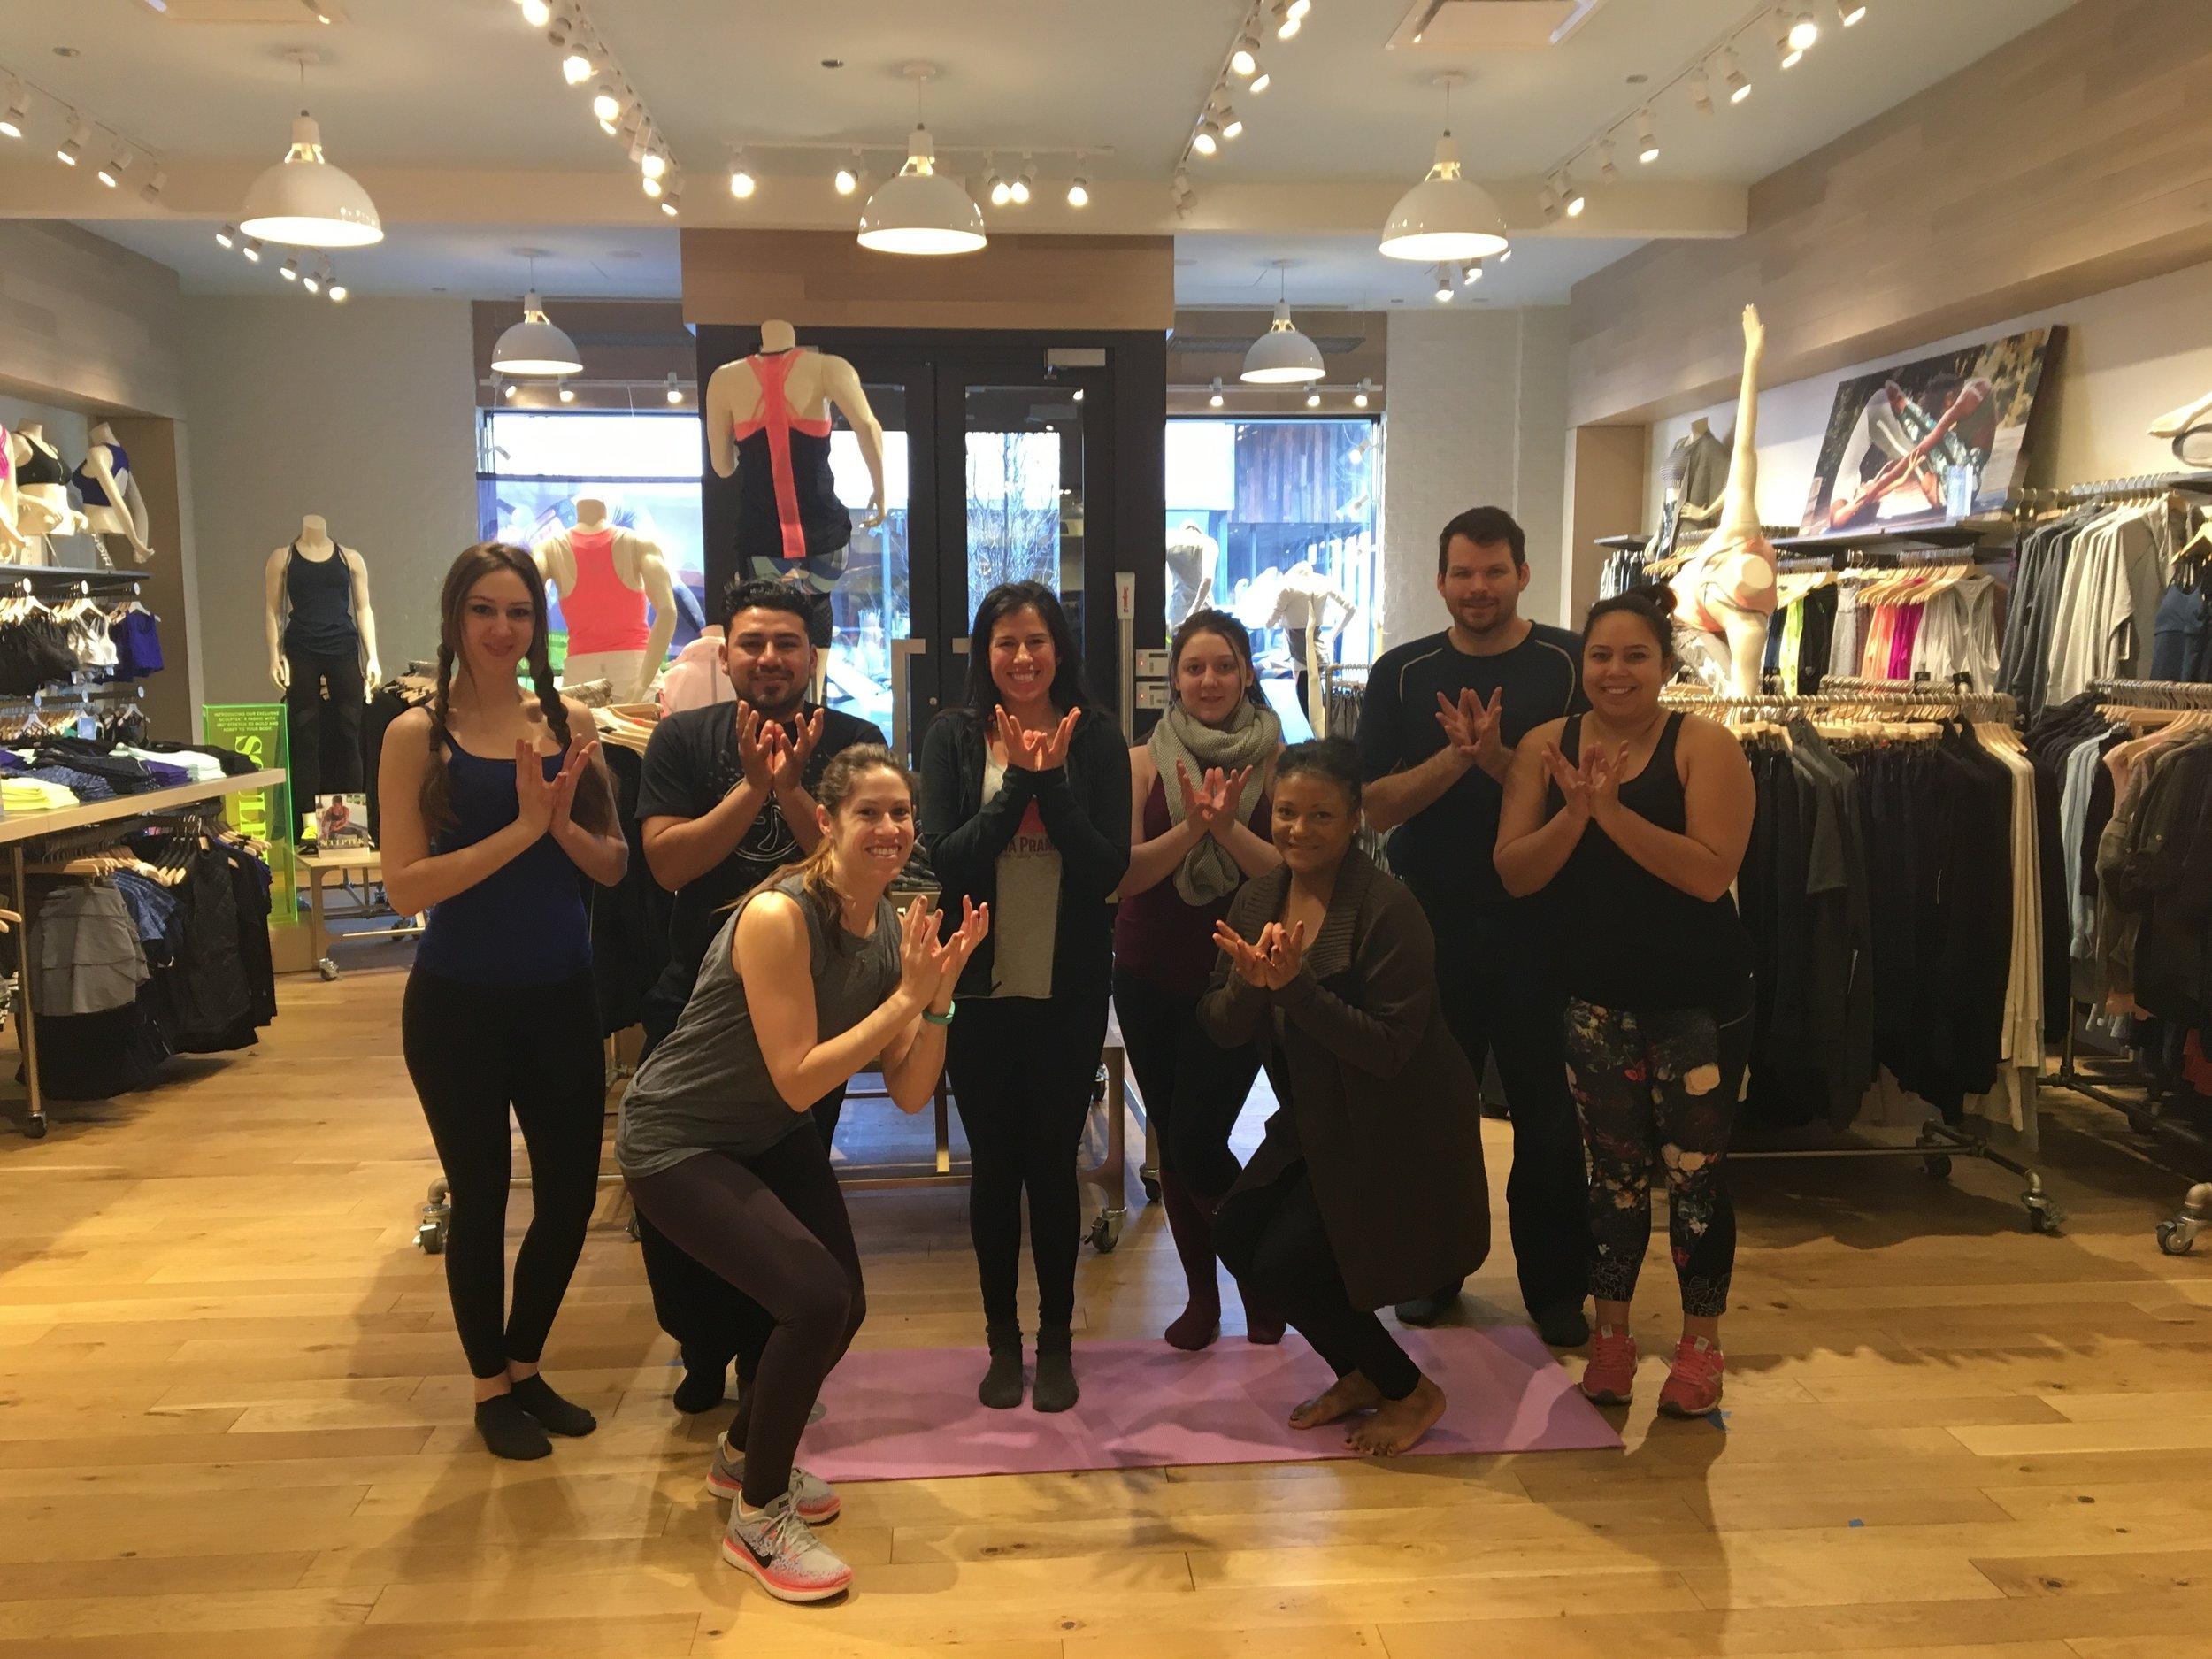 Viva Prana_Yoga_Bowspring_Wellness_Chicago_Blog_021017.JPG